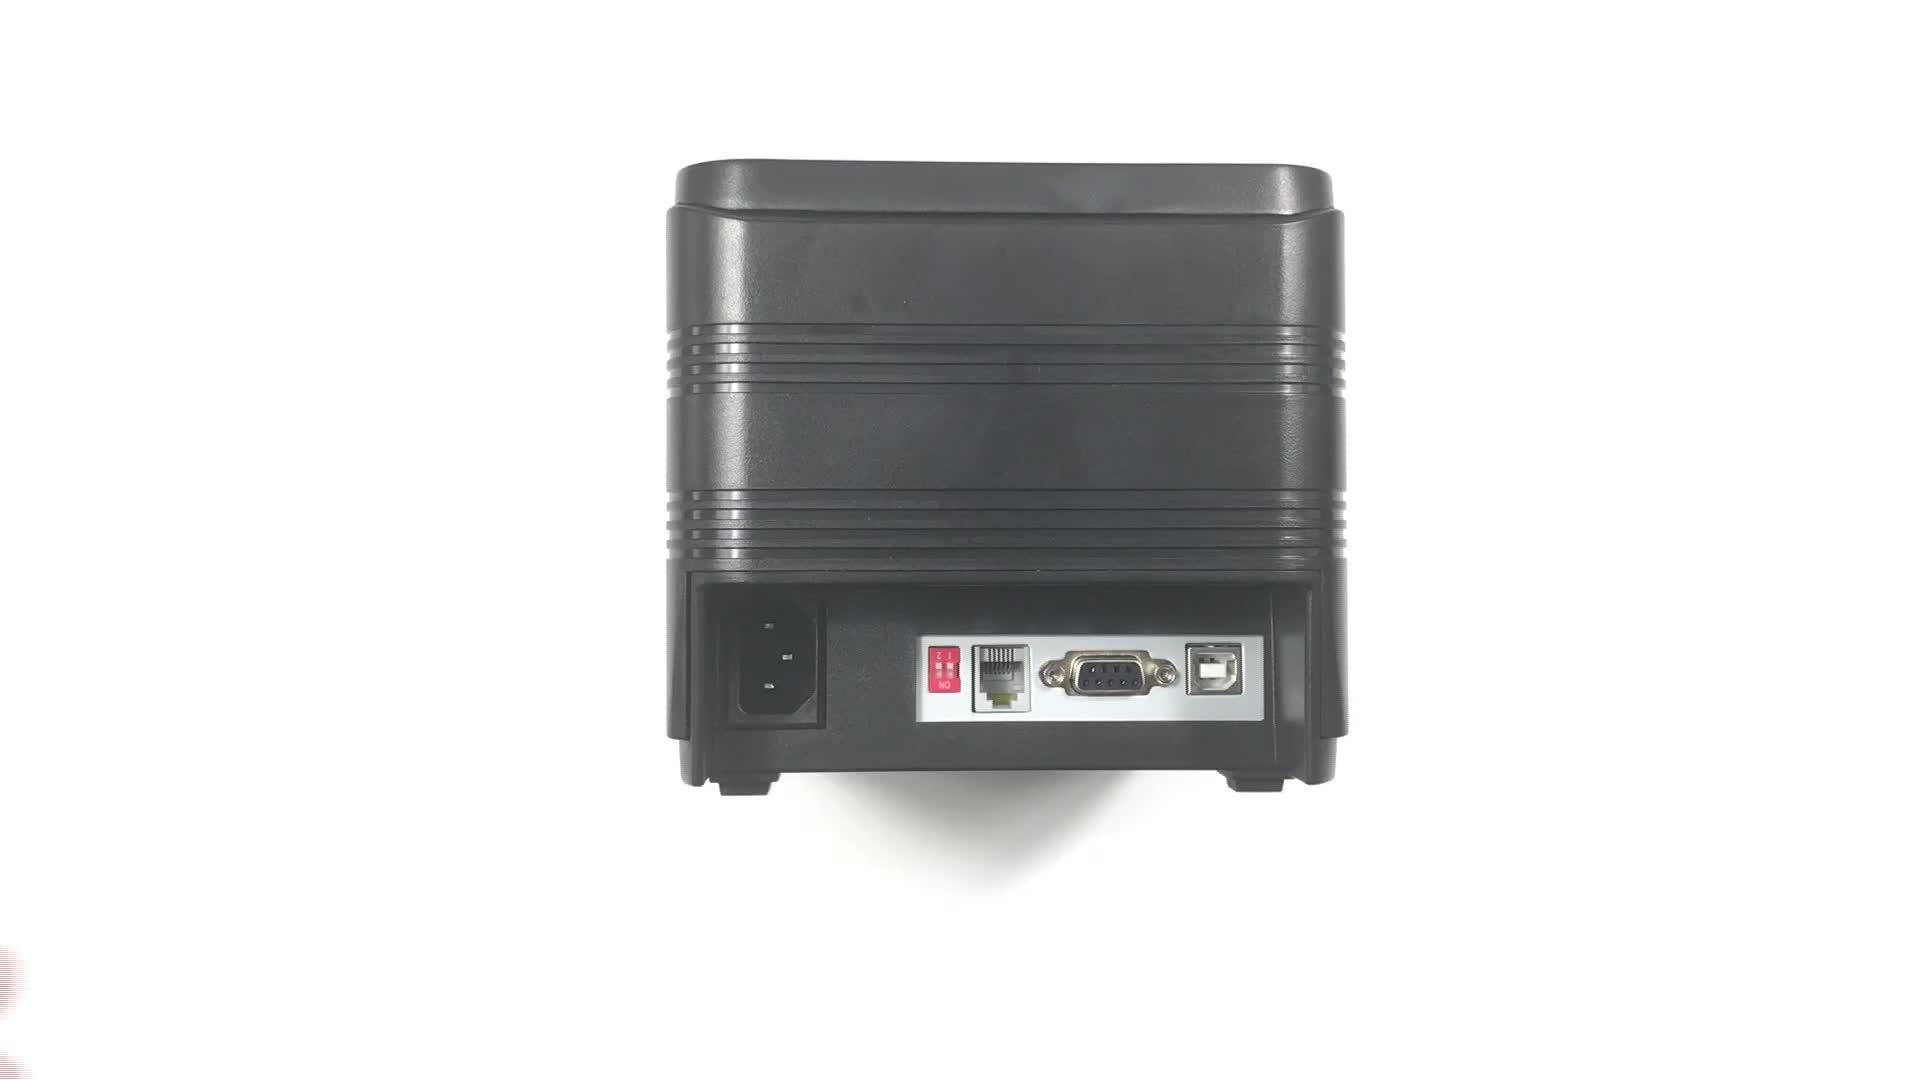 80 MM 자동 절단기 식당 주방 슈퍼마켓 프린터 USB + 이더넷 열 영수증 프린터